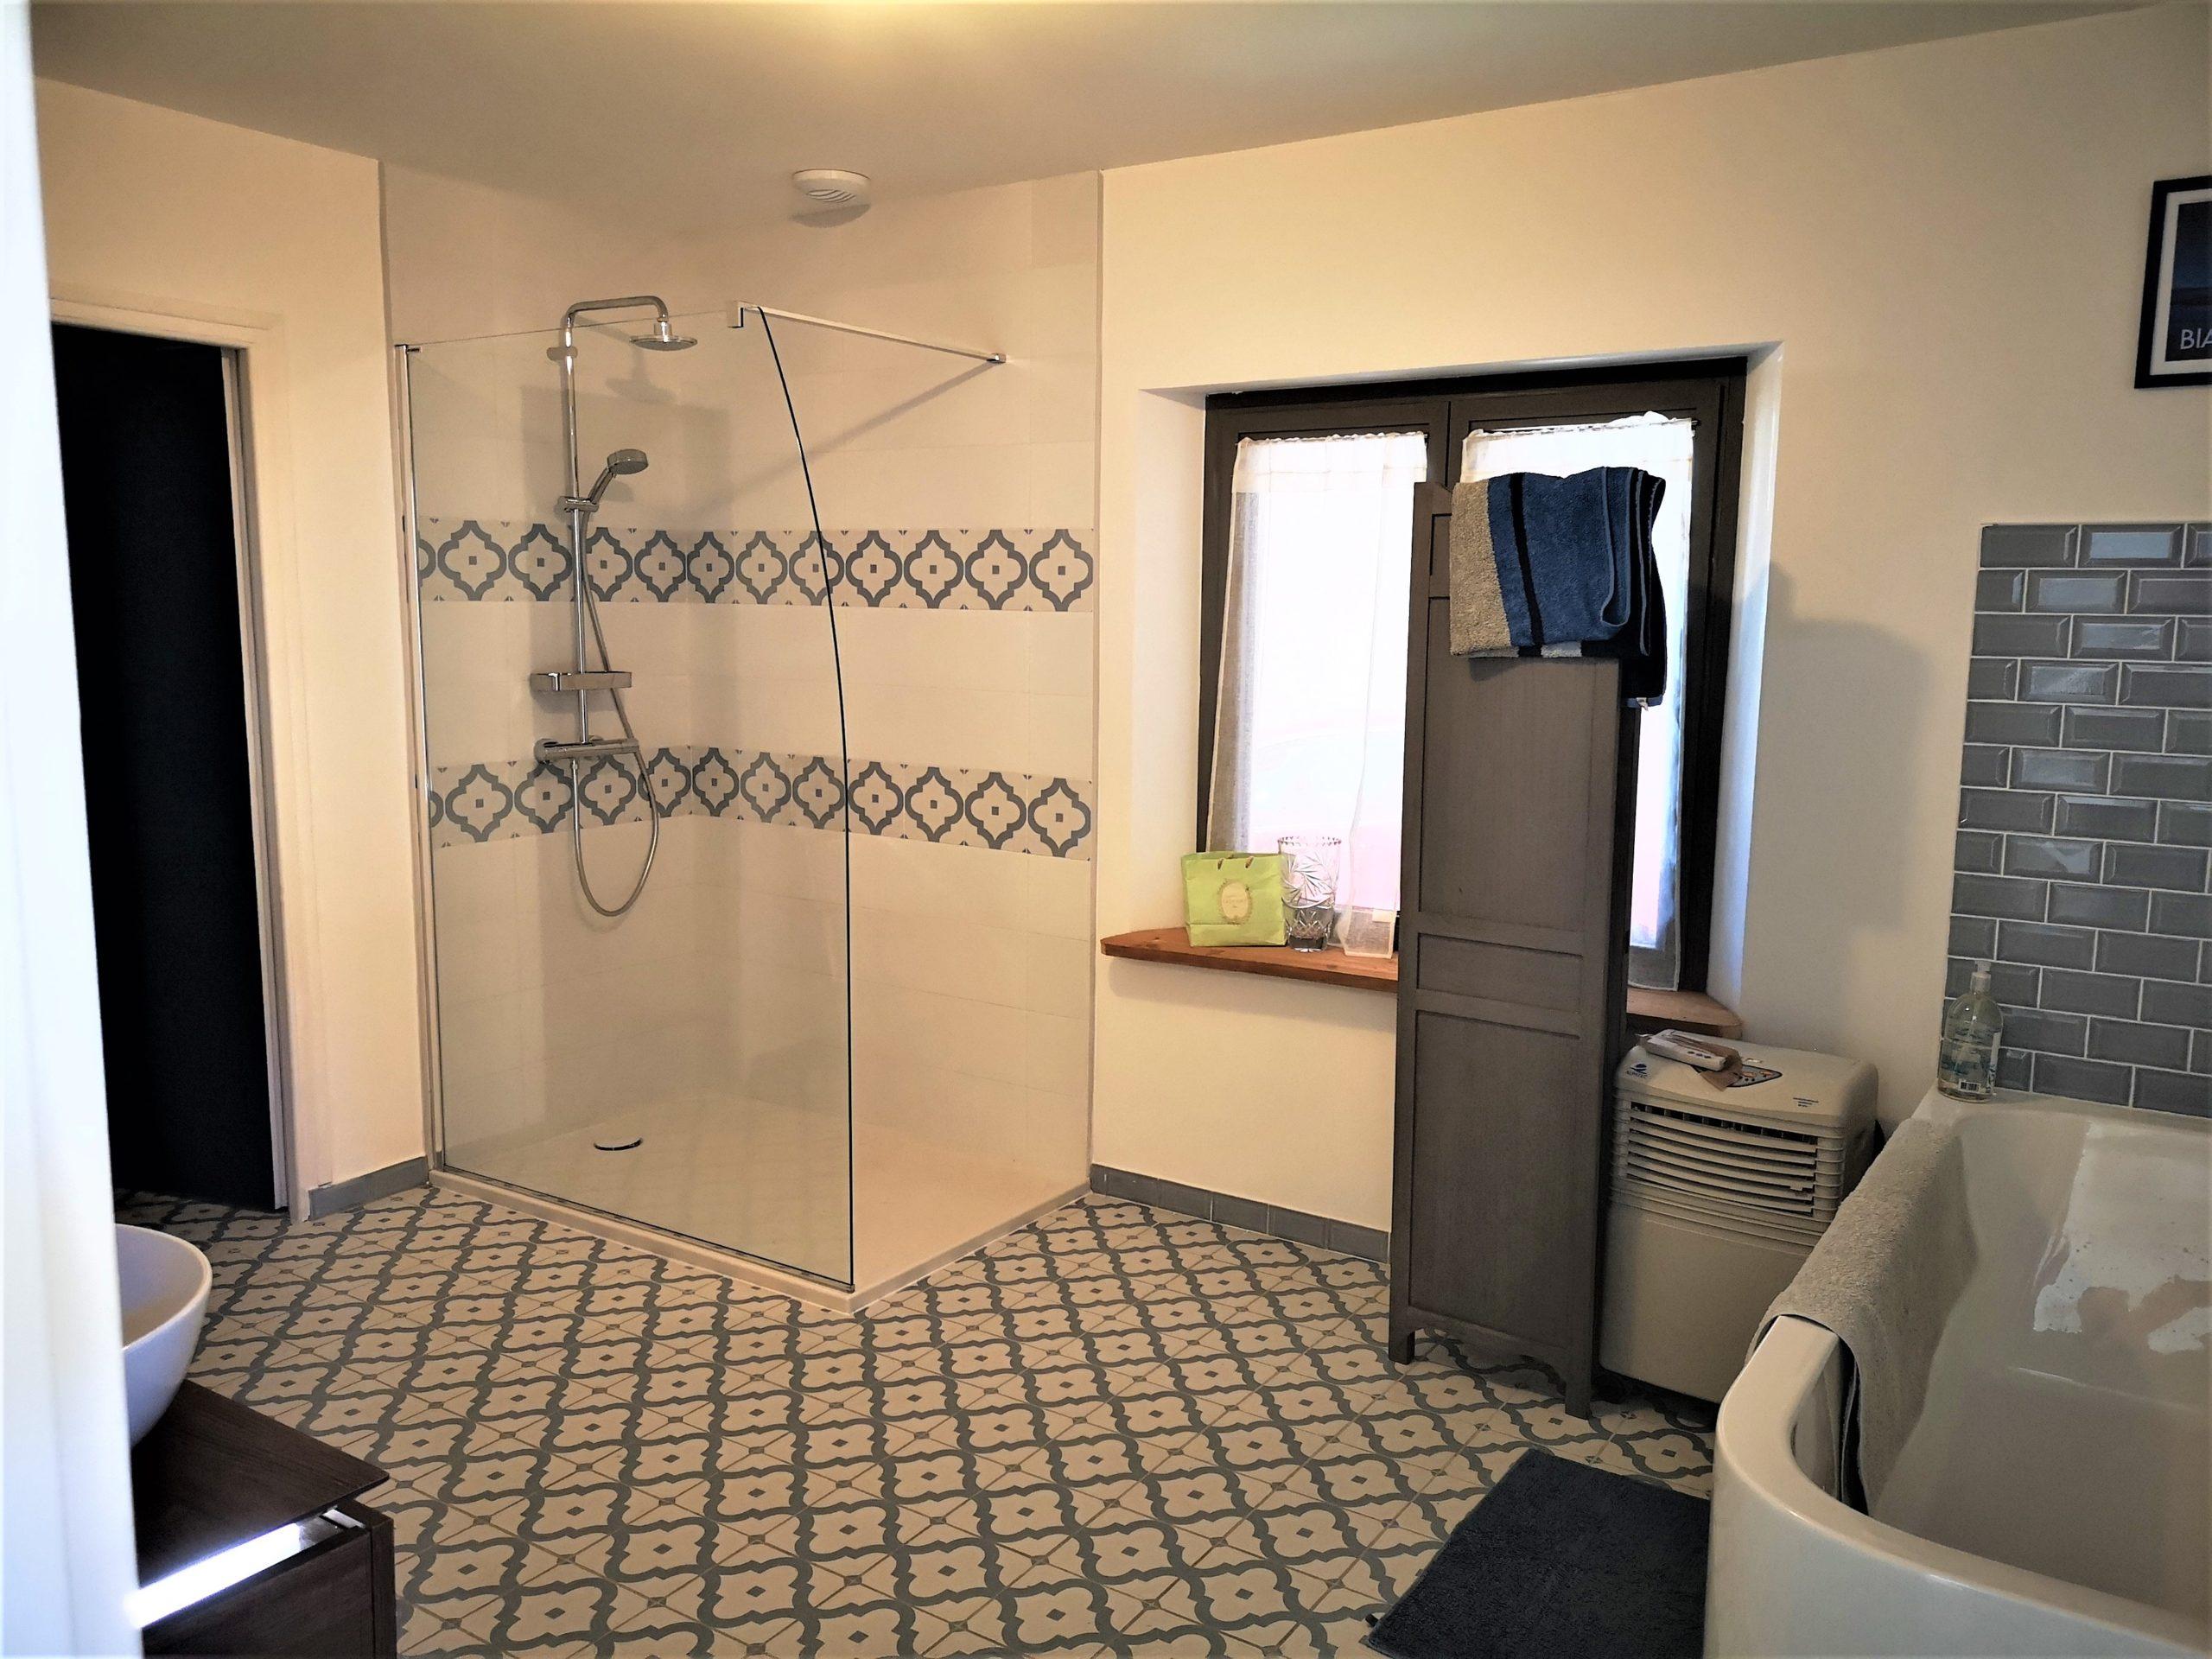 batitech renovation maison montauban résultat